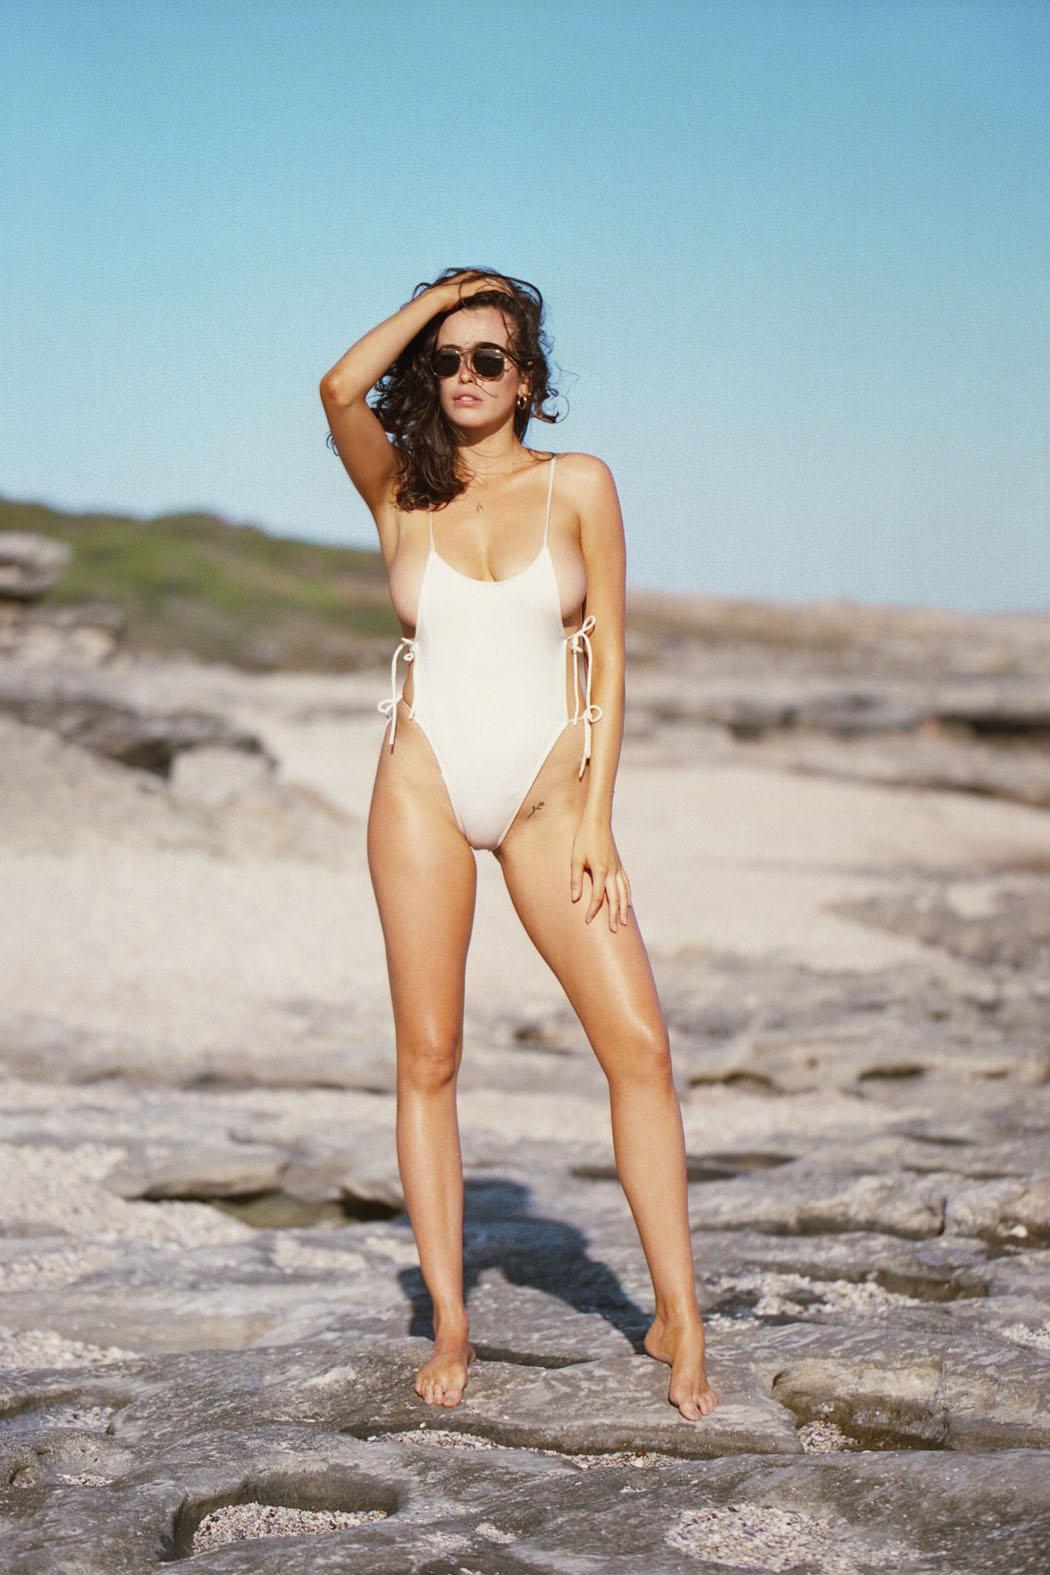 sarah-stephens-seaside-erotic-photo-by-cameron-mackie-07